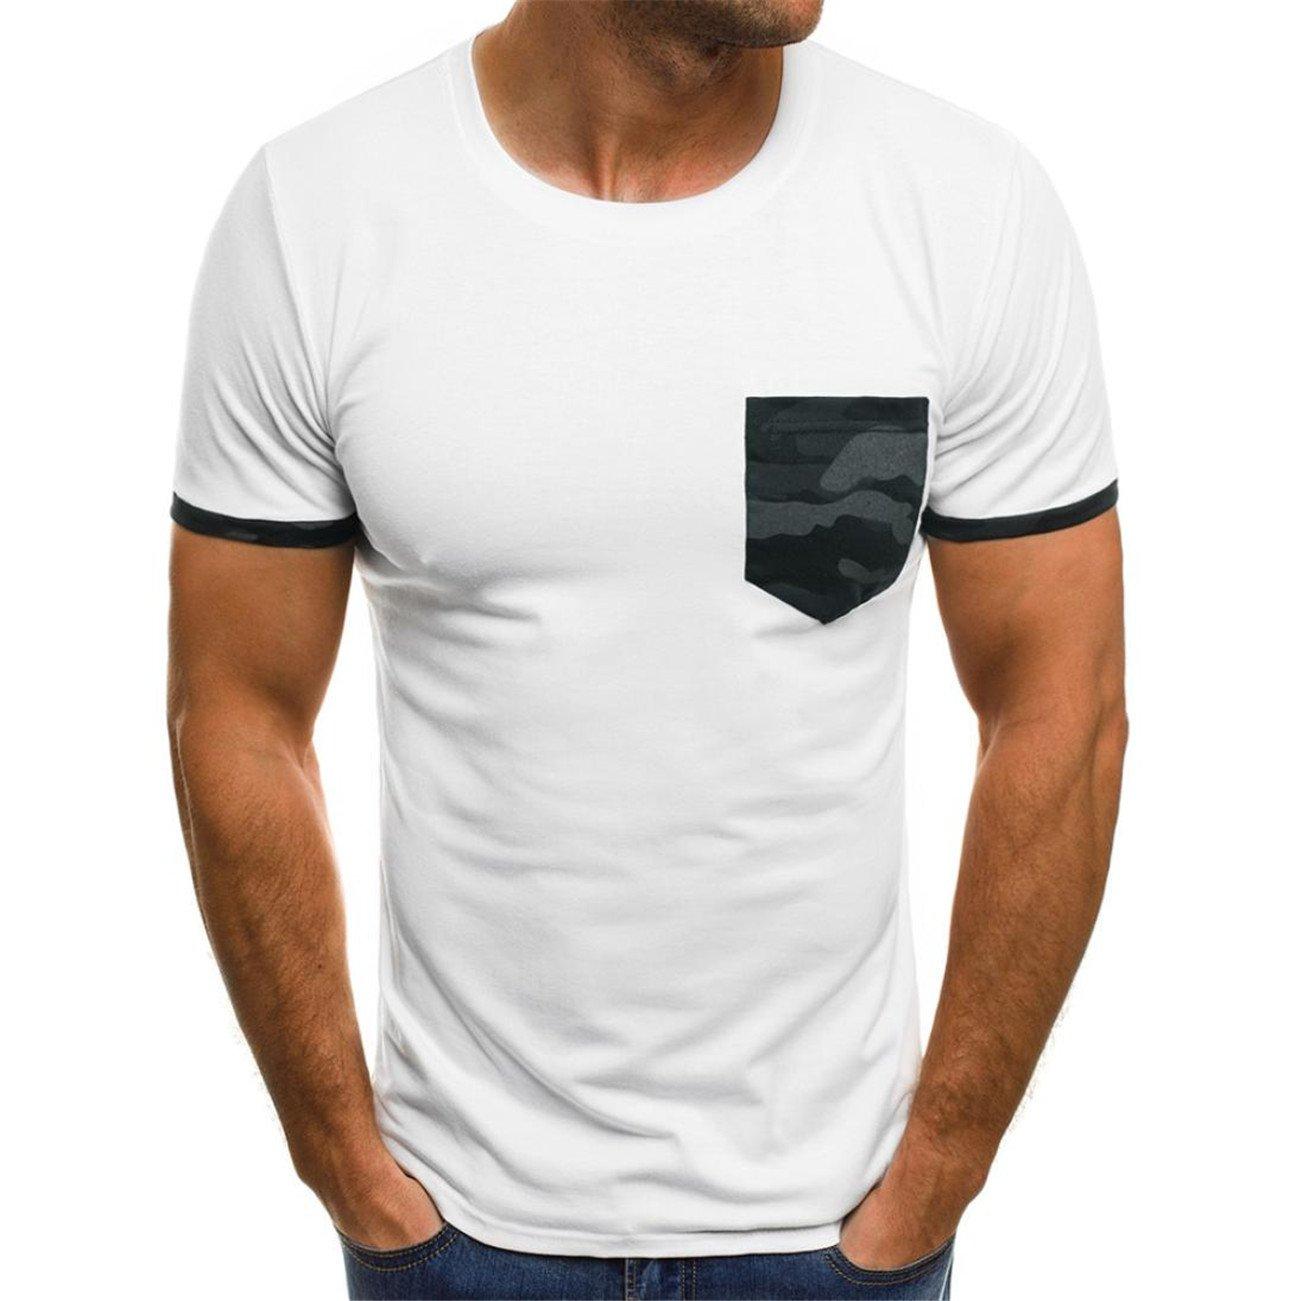 Magiyard La Mode Personnalit/é Hommes Casual Mince Manches Courtes Poches T-Shirt Chemisier Top Blouse